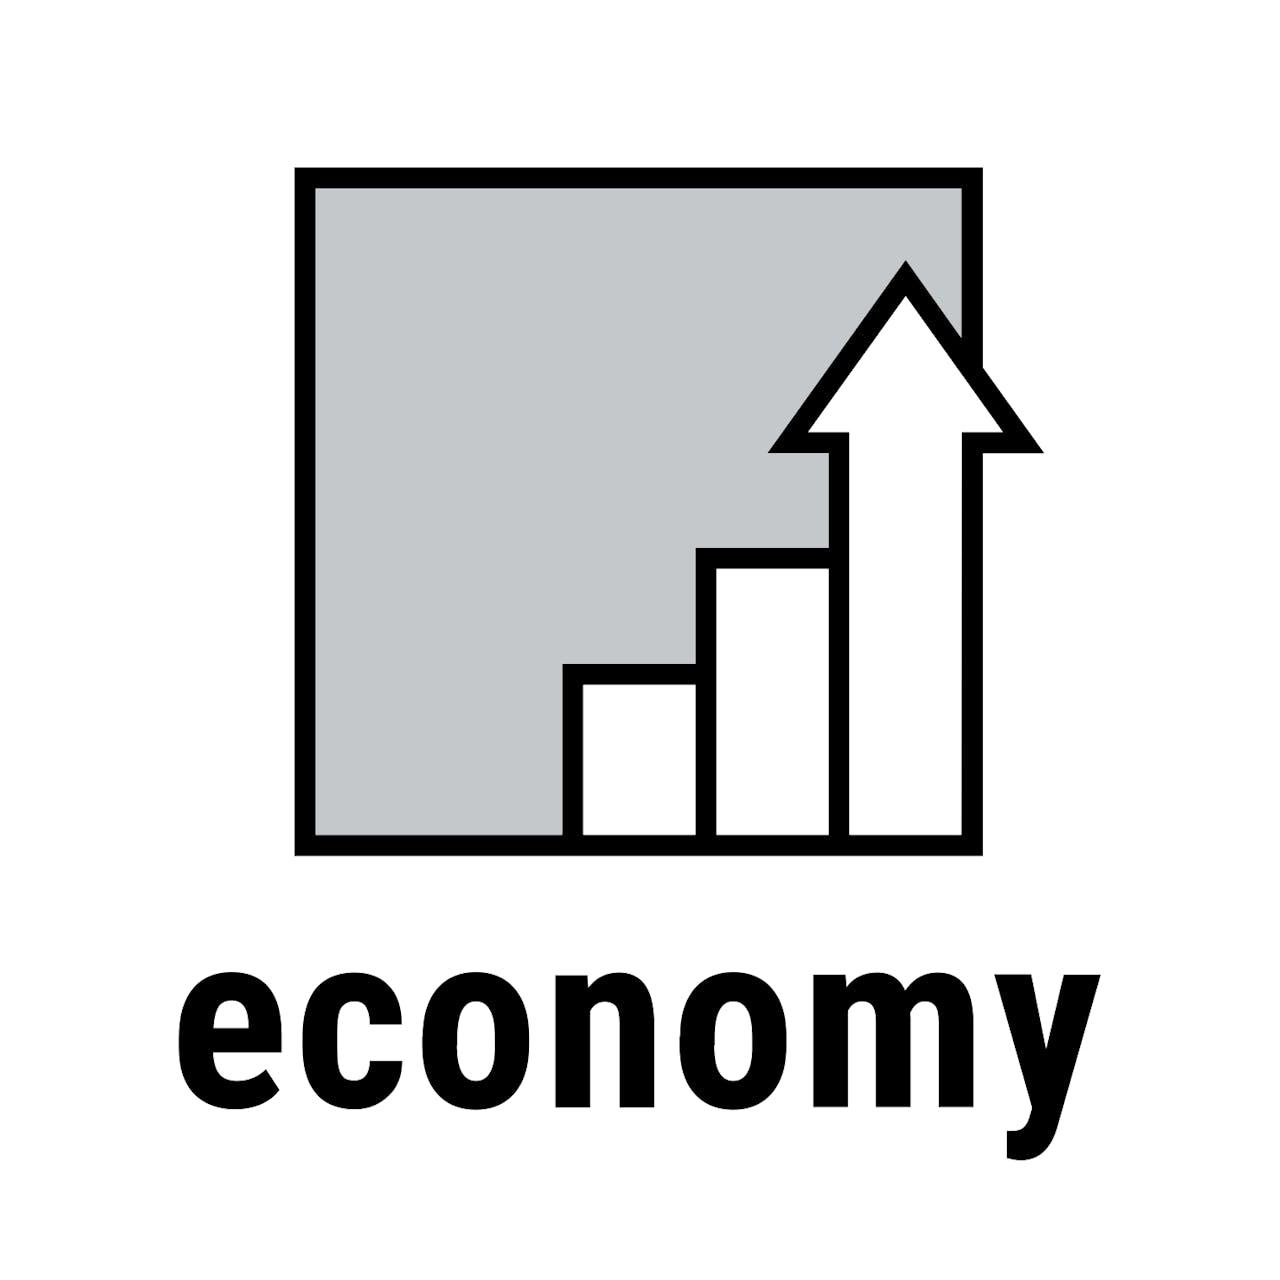 economy Logo ratioform